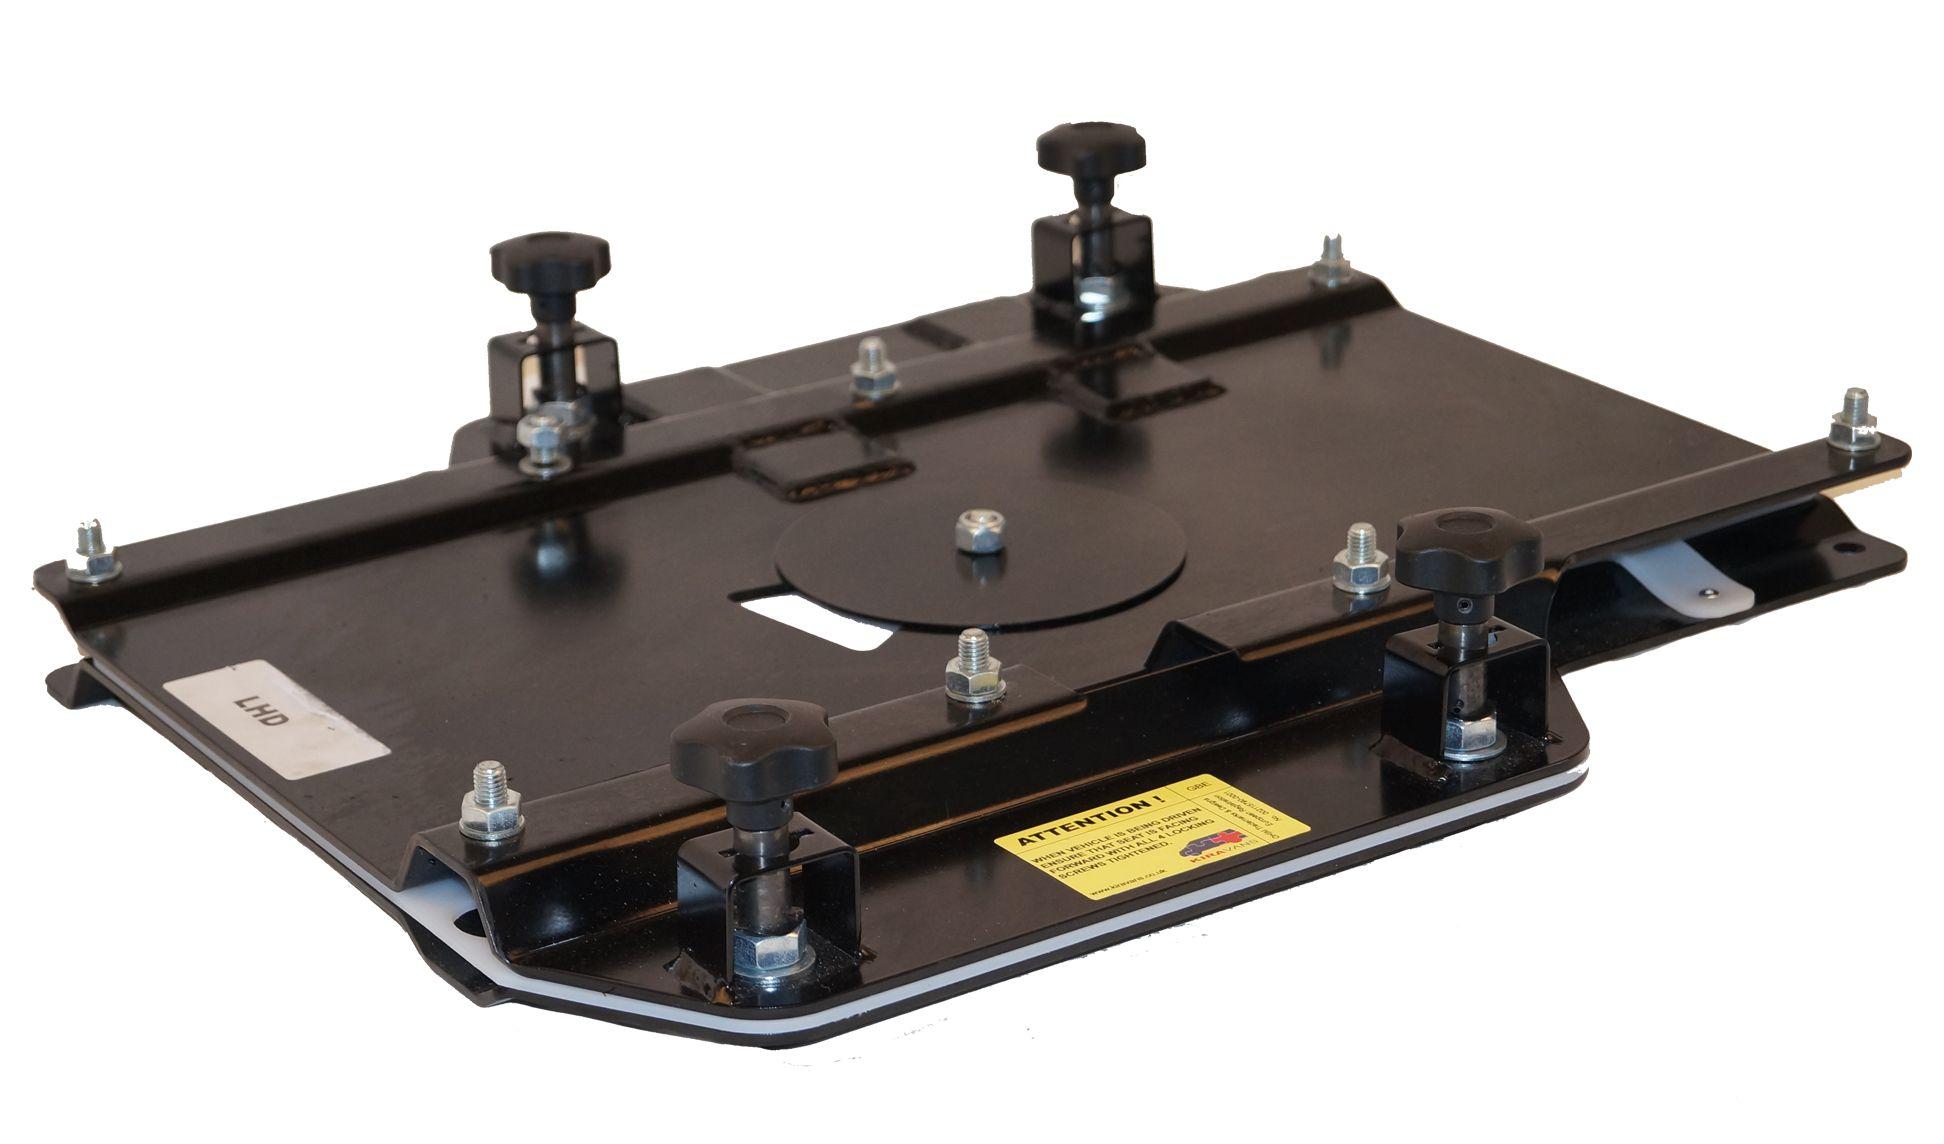 drehkonsolen und adapter drehkonsole beifahrer. Black Bedroom Furniture Sets. Home Design Ideas